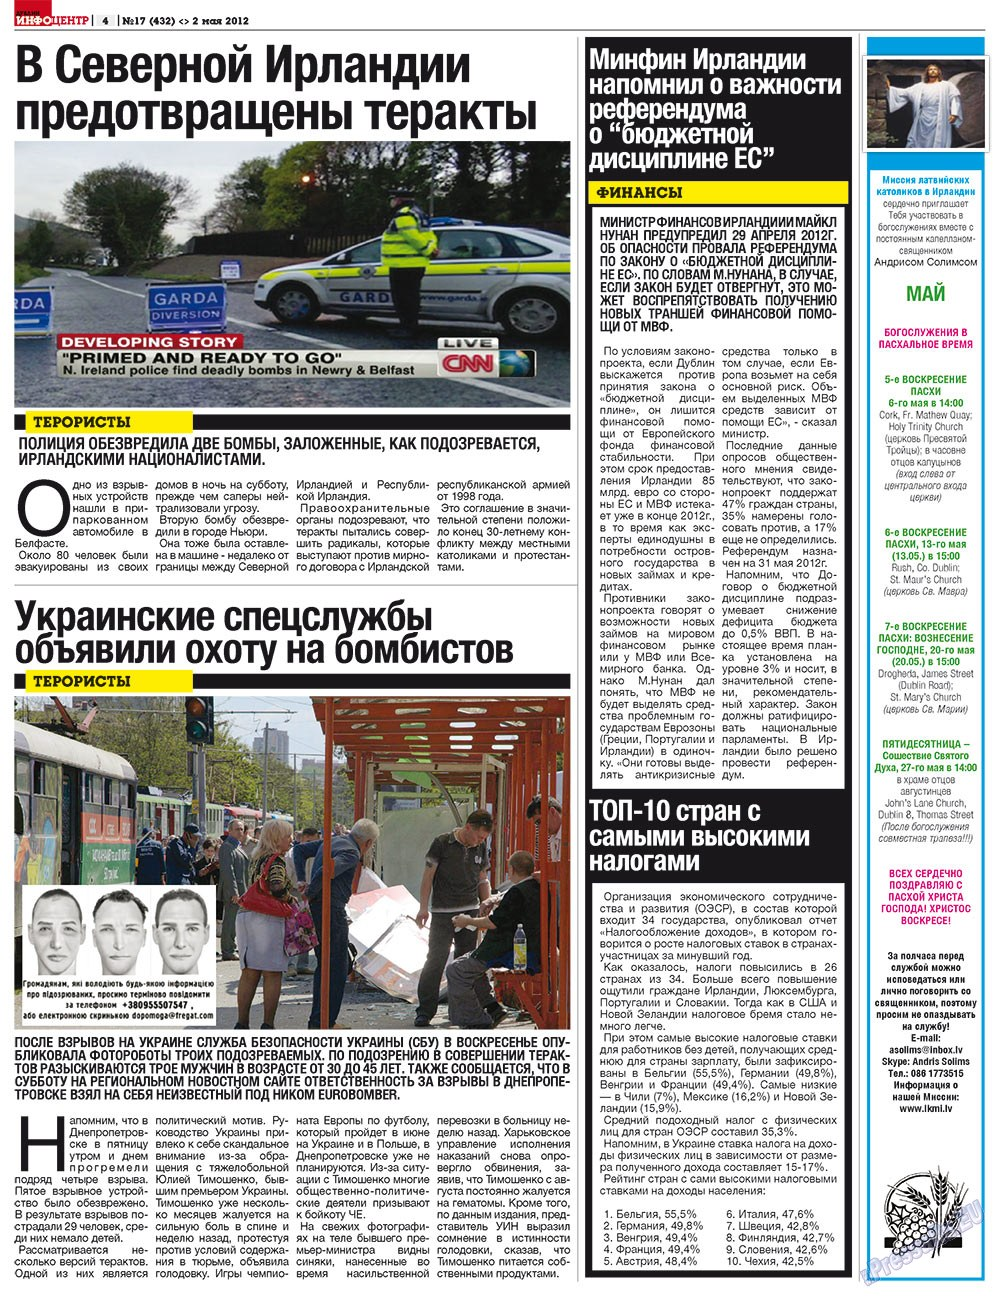 Дублин инфоцентр (газета). 2012 год, номер 17, стр. 4